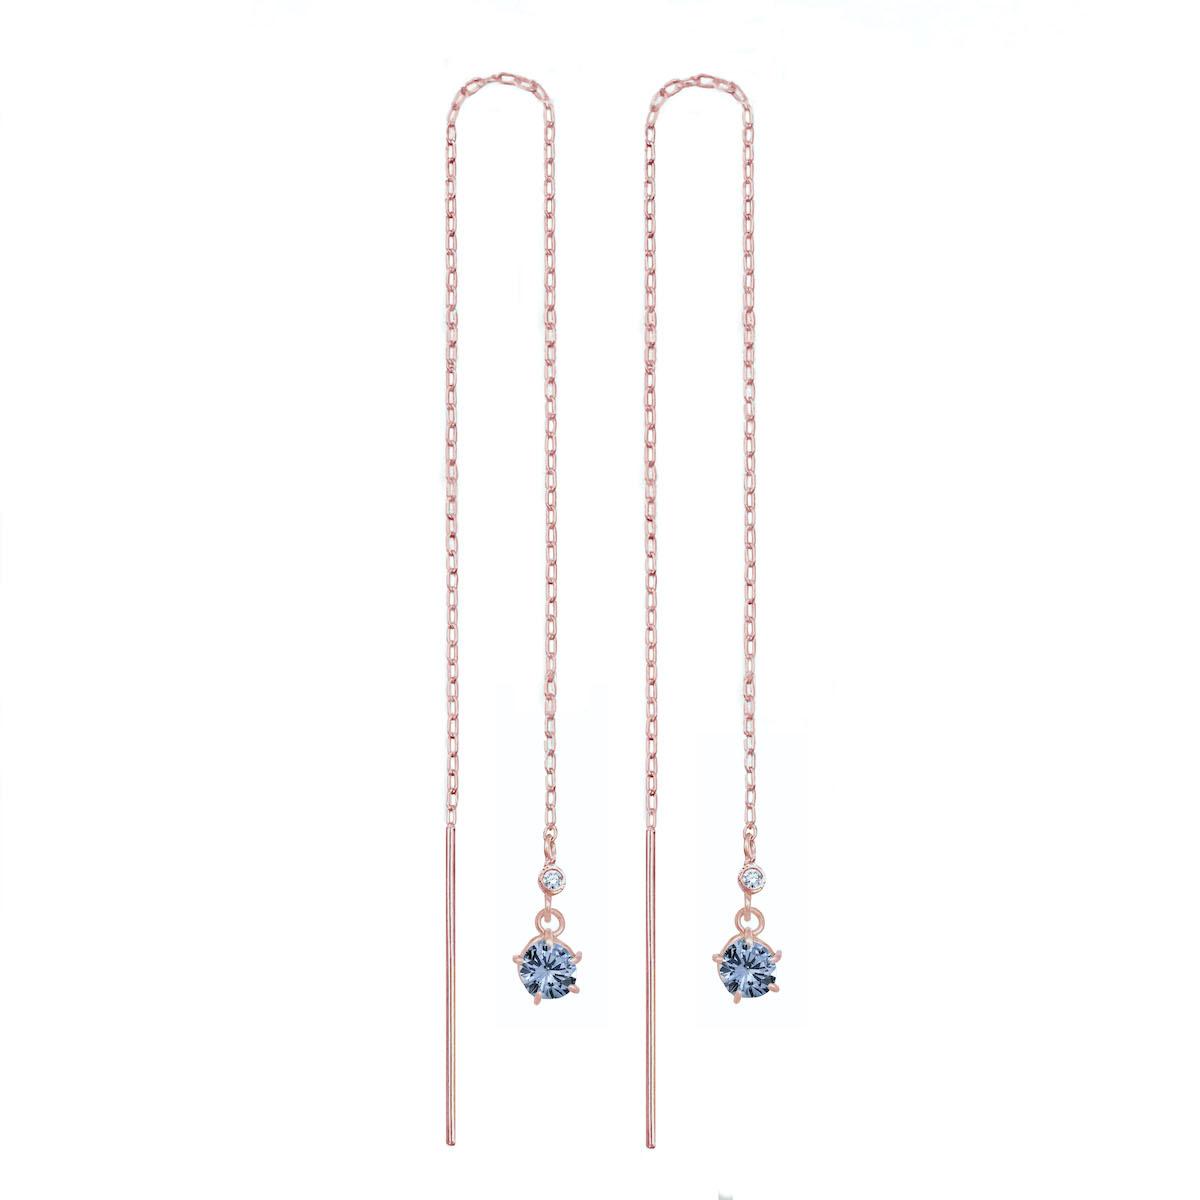 Blue-Sapphire-Drop-Threader-Rose-Gold-32-3 RG copy